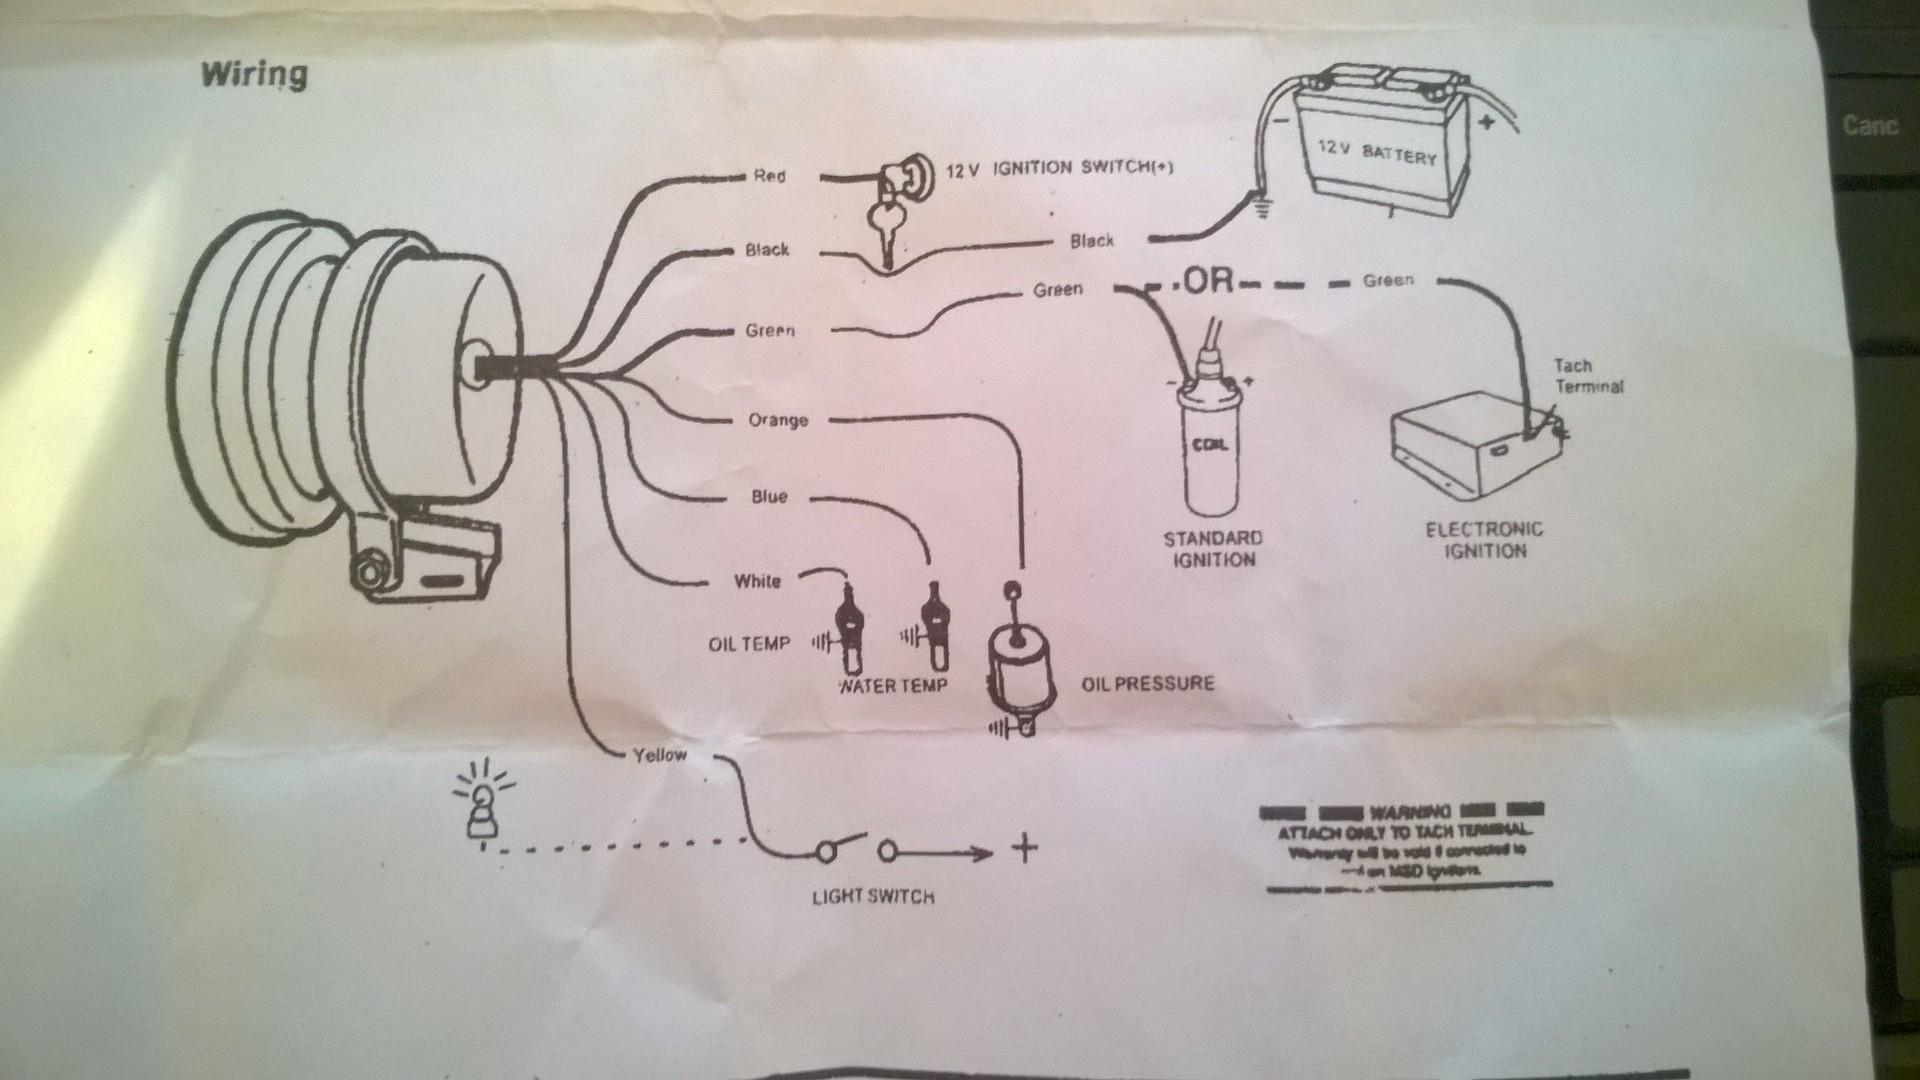 Drehzahlmesser Oldtimer 12V - Frequenz verdoppeln - Mikrocontroller.net